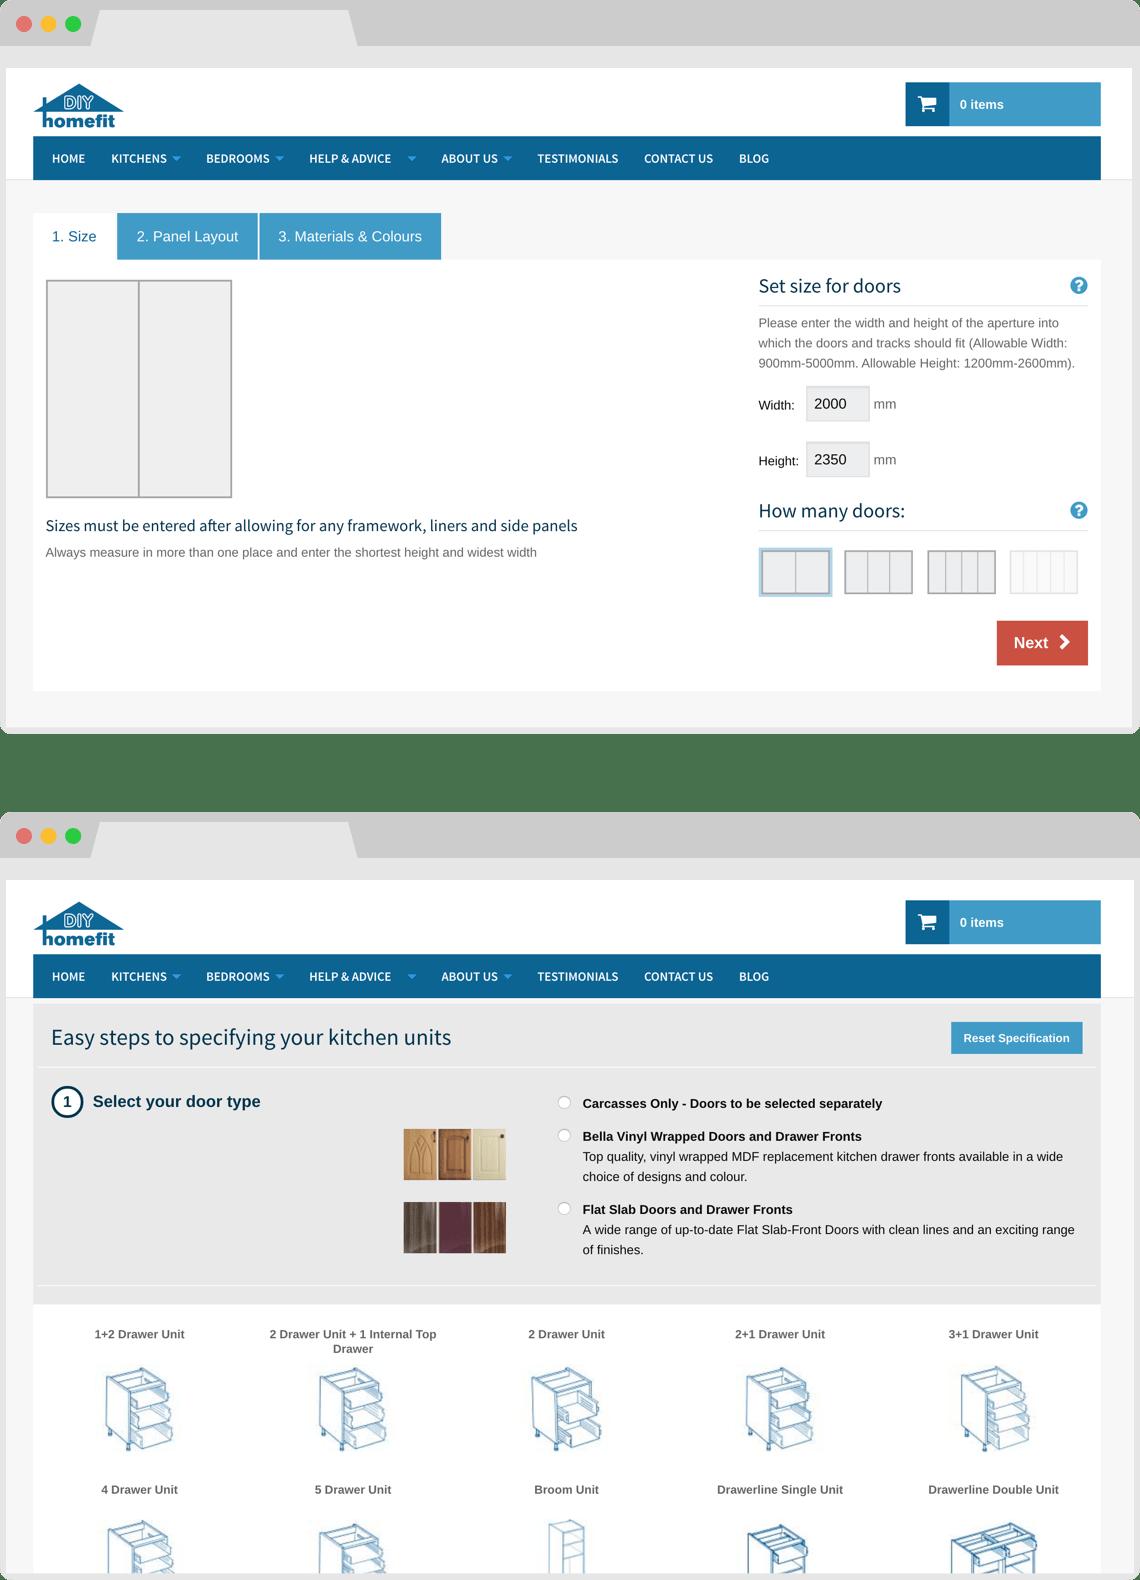 Responsive e-commerce design by HeavyGuru, London